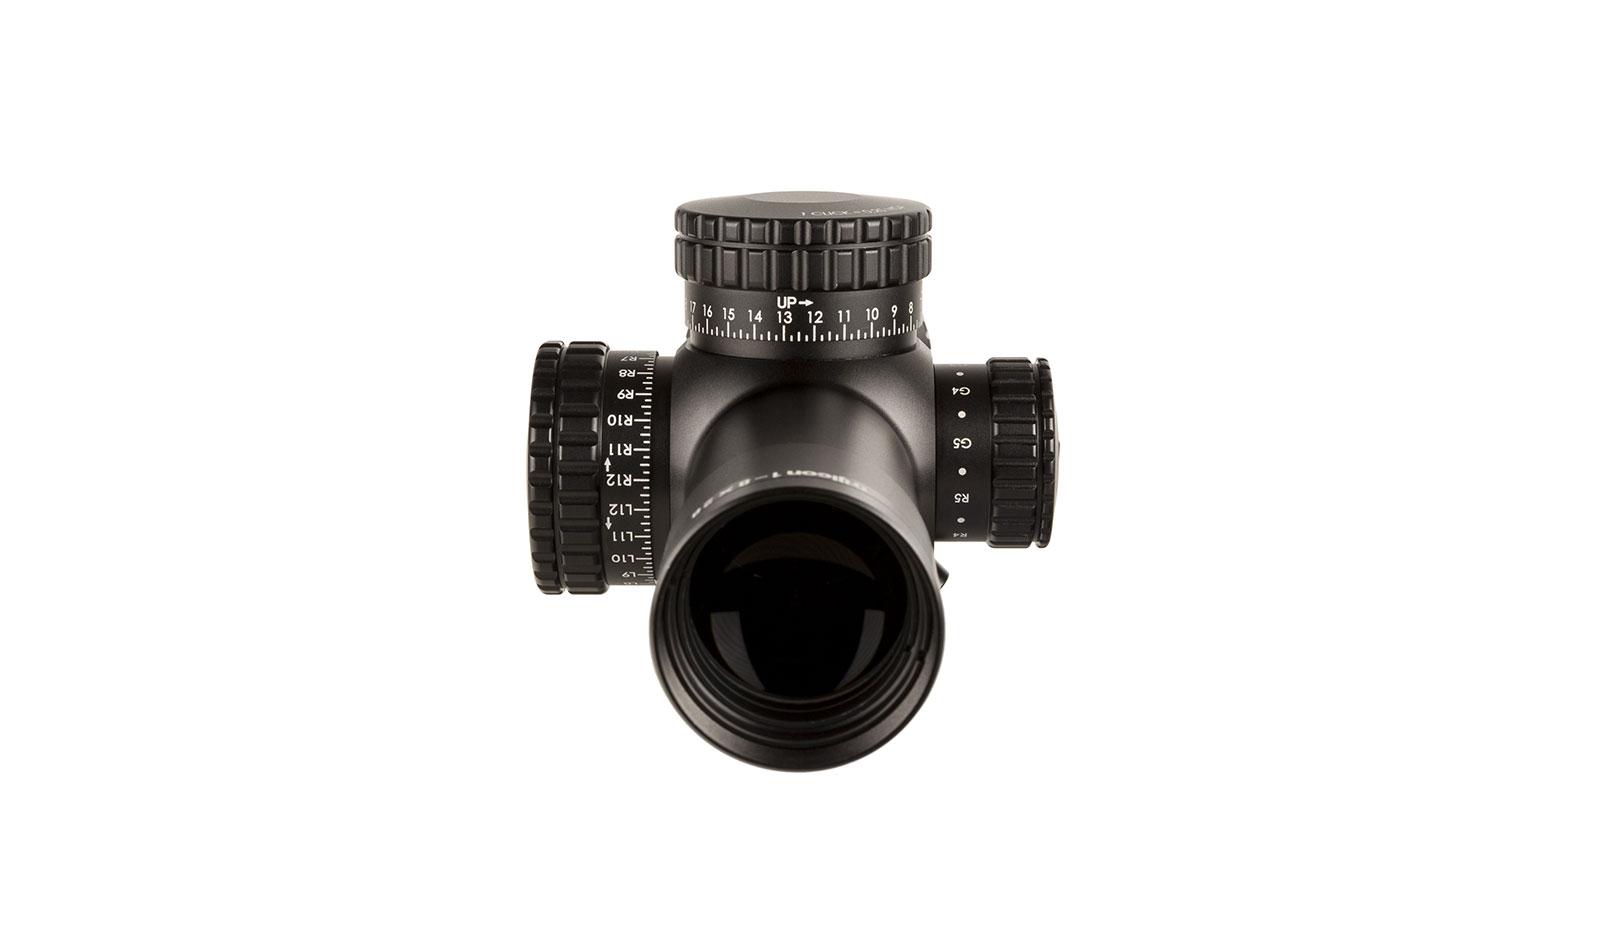 CRHX828-C-2900031 angle 8